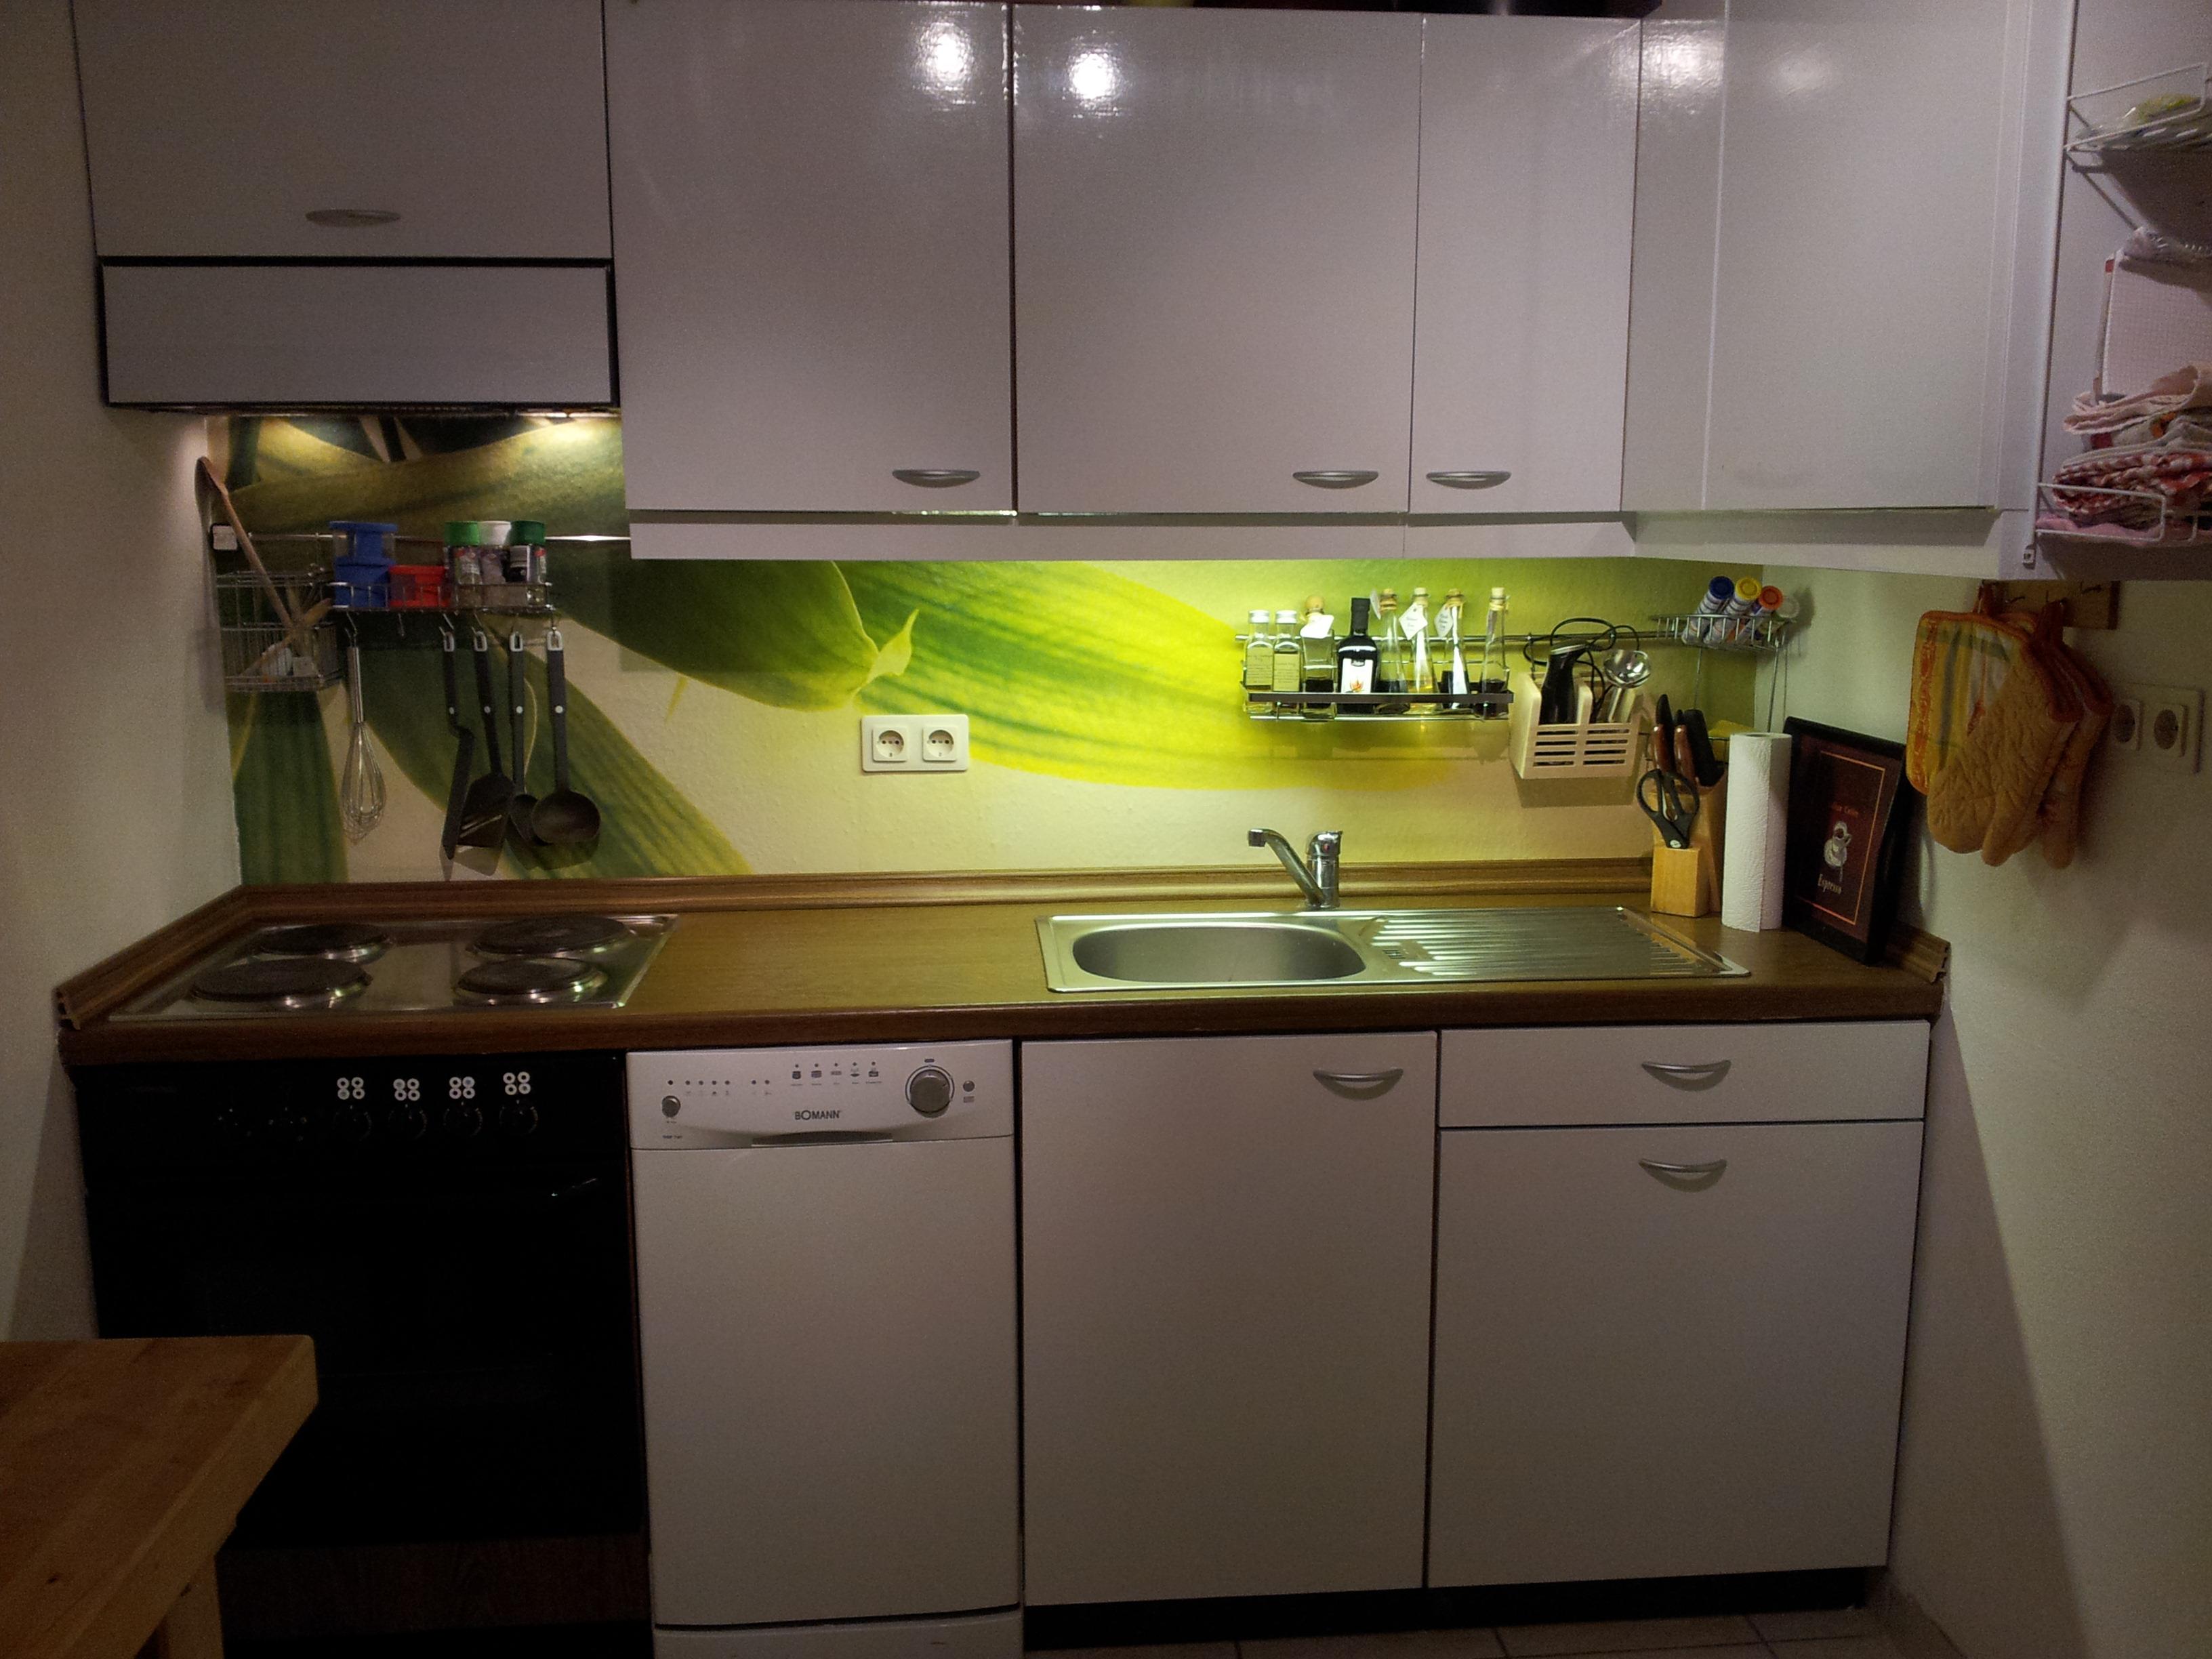 Elefantenhaut Tapete Küche  Küche Tapetenschutz  Latexfarbe In